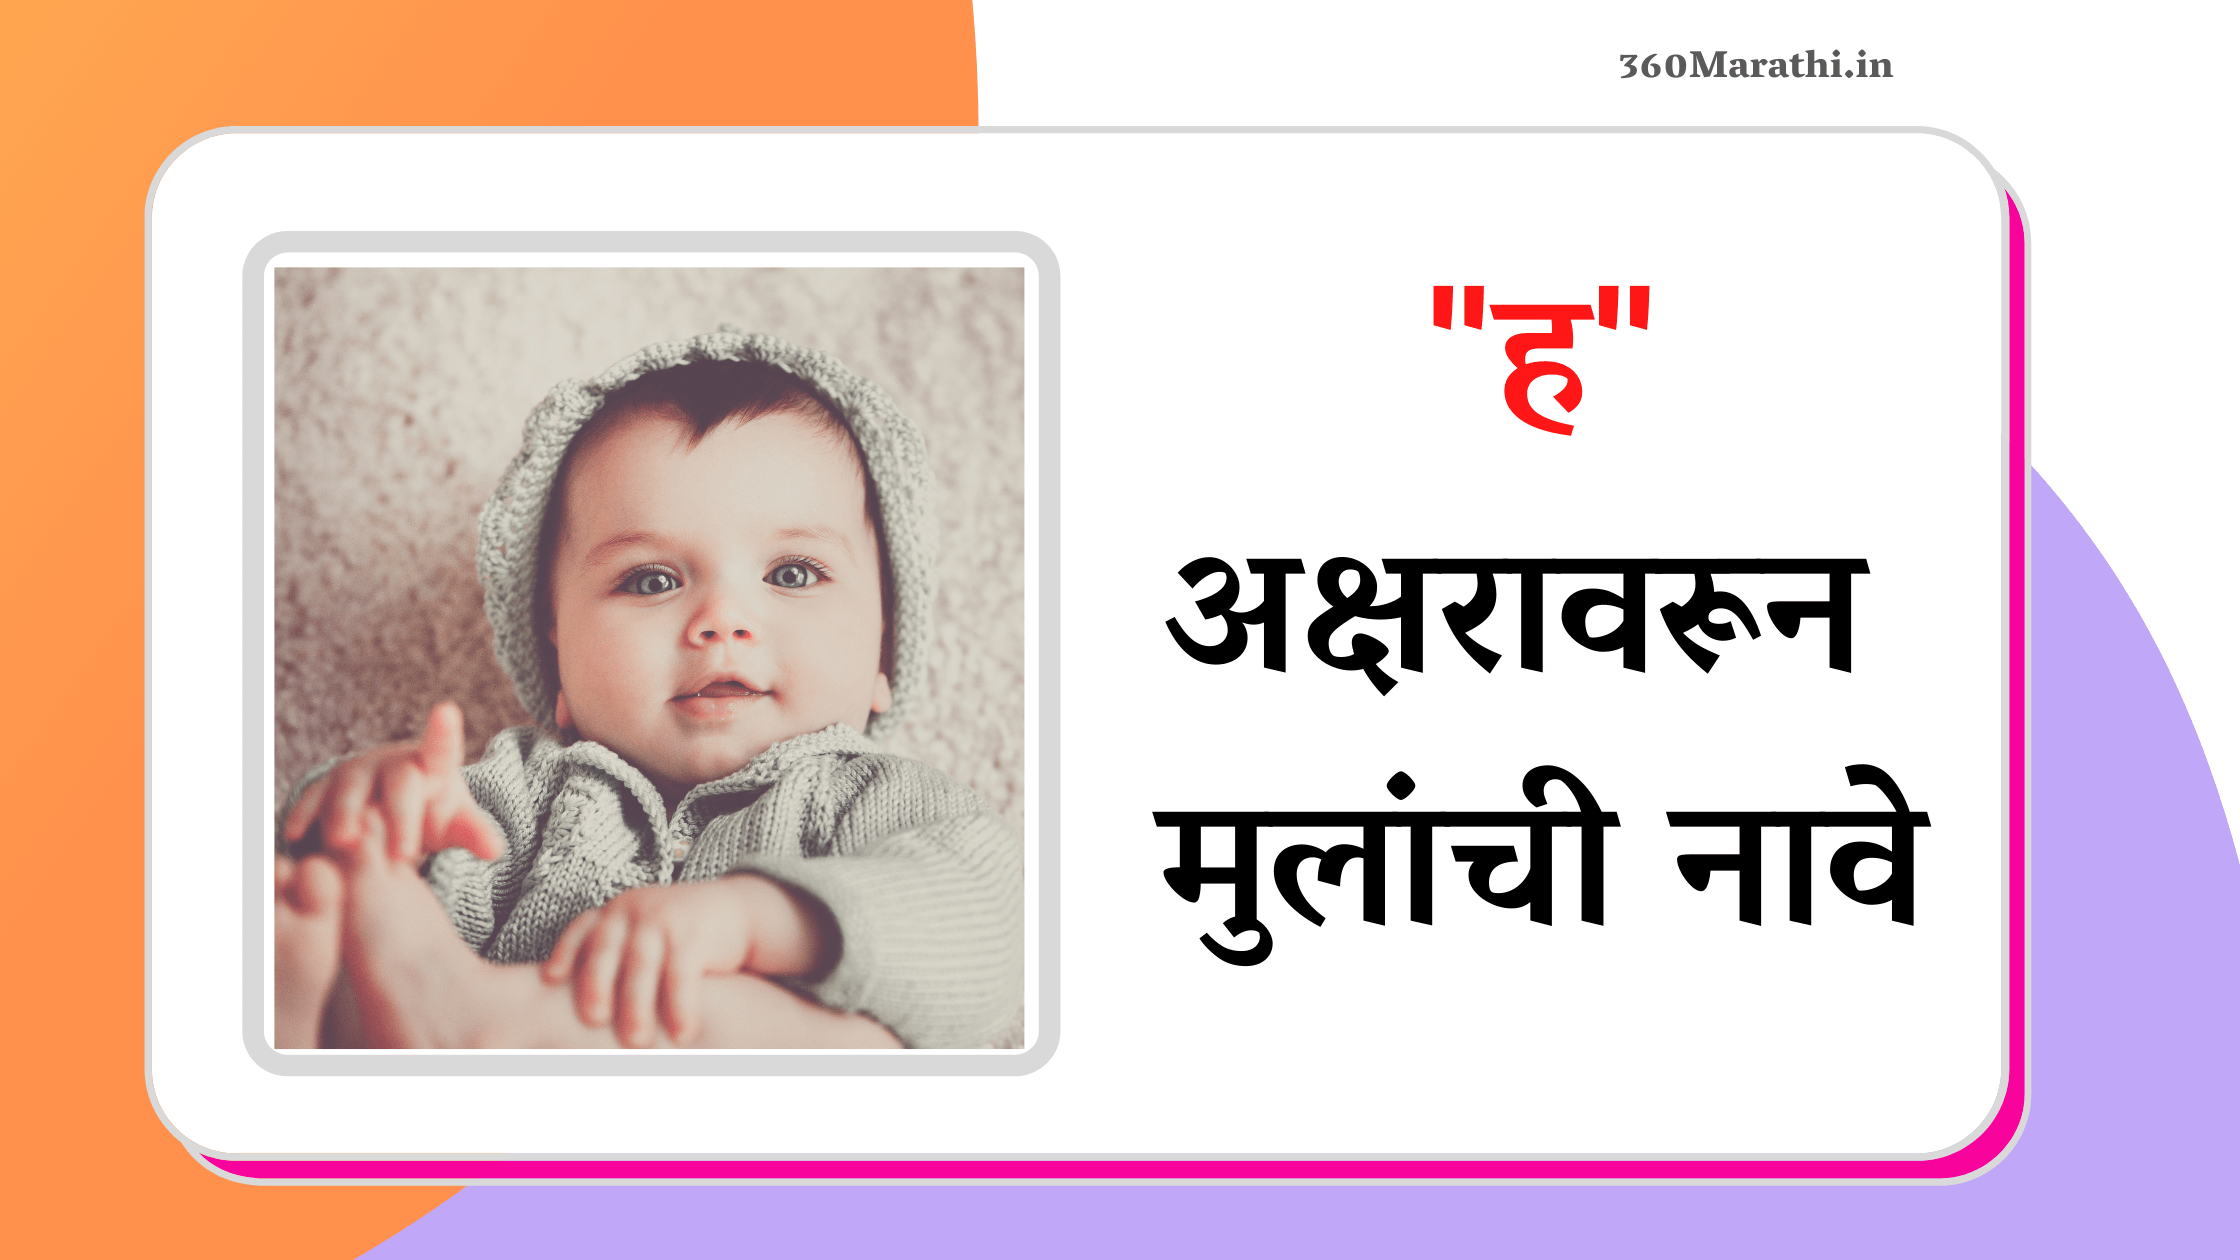 ह अक्षरावरून मुलांची १०० नावं | Best Baby Boy Names Starting From 'H' In Marathi | H Varun Mulanchi Nave